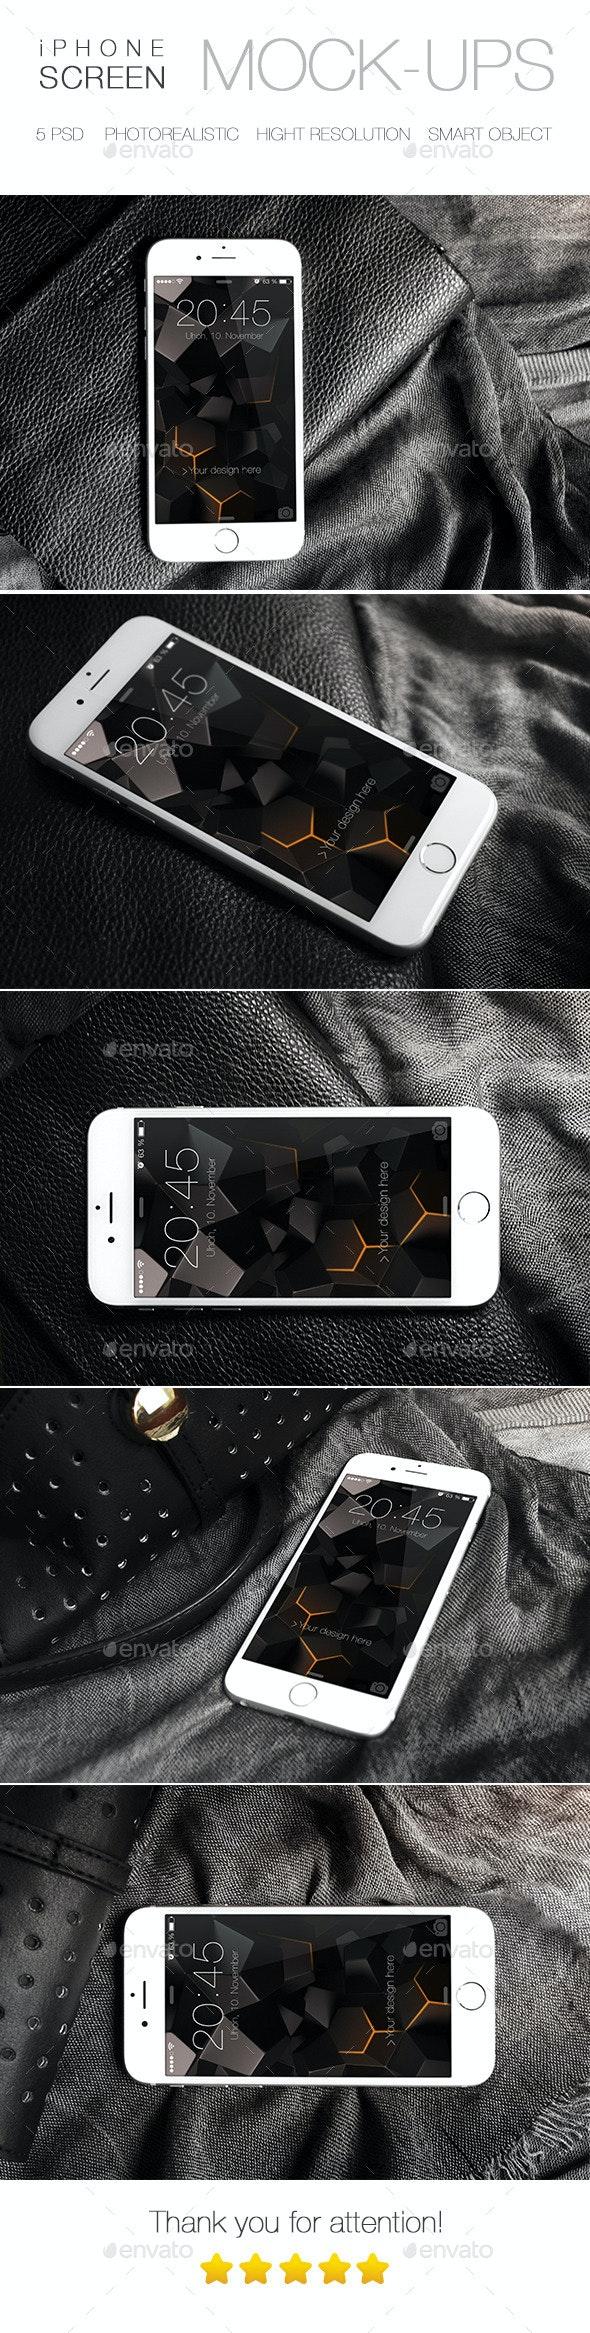 Photorealistic iPhone 6 Mock-Up - Mobile Displays